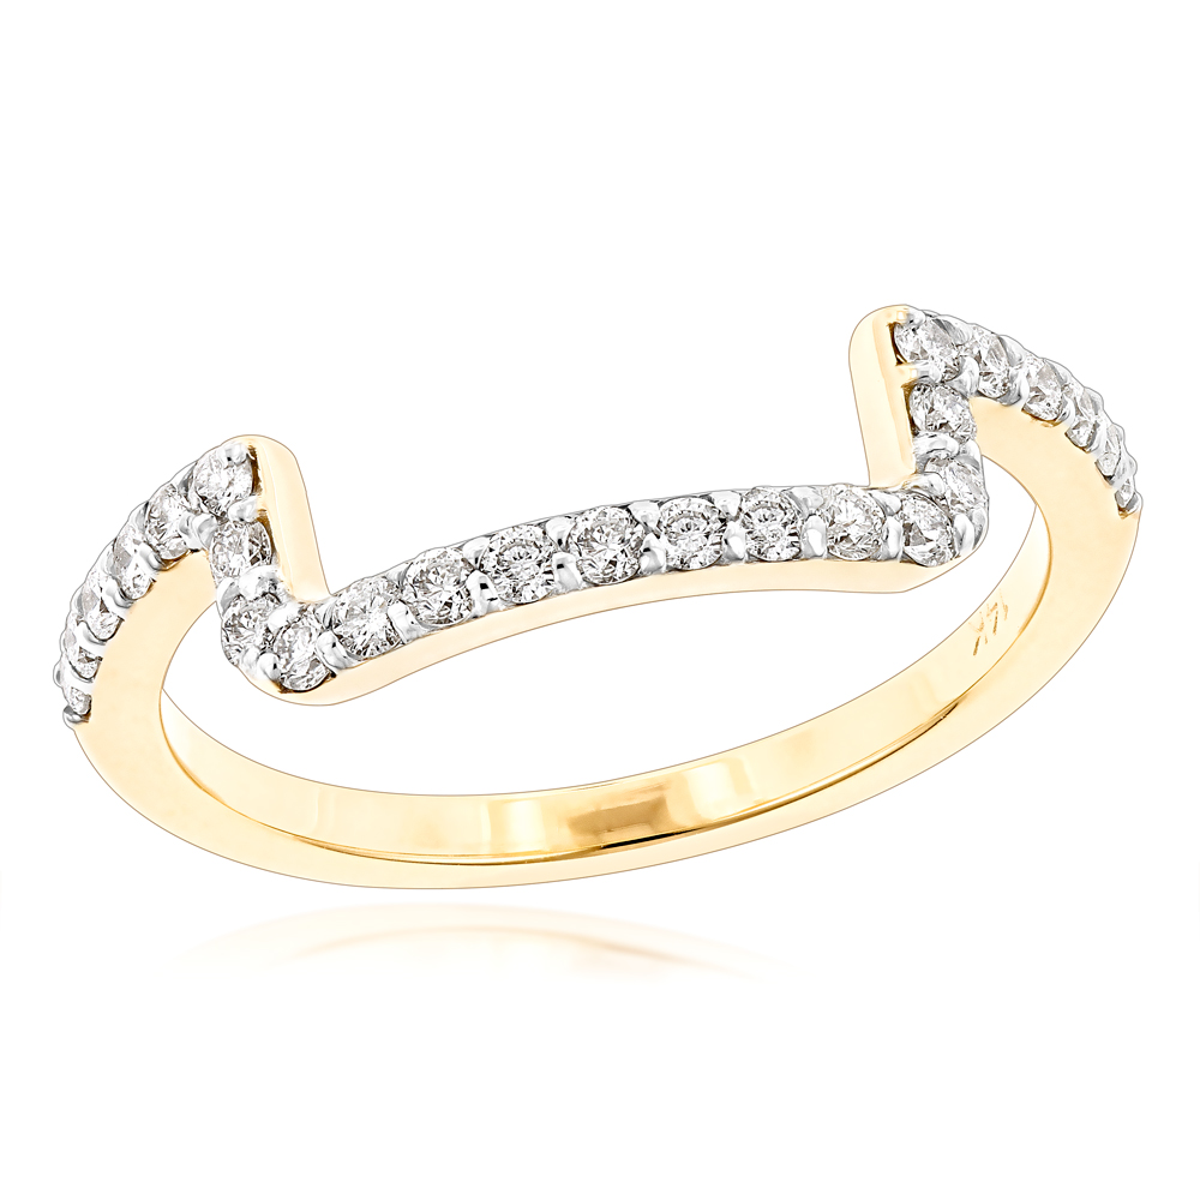 14K Gold Engagement Ring Matching Diamond Wedding Band for Women 0.45ct